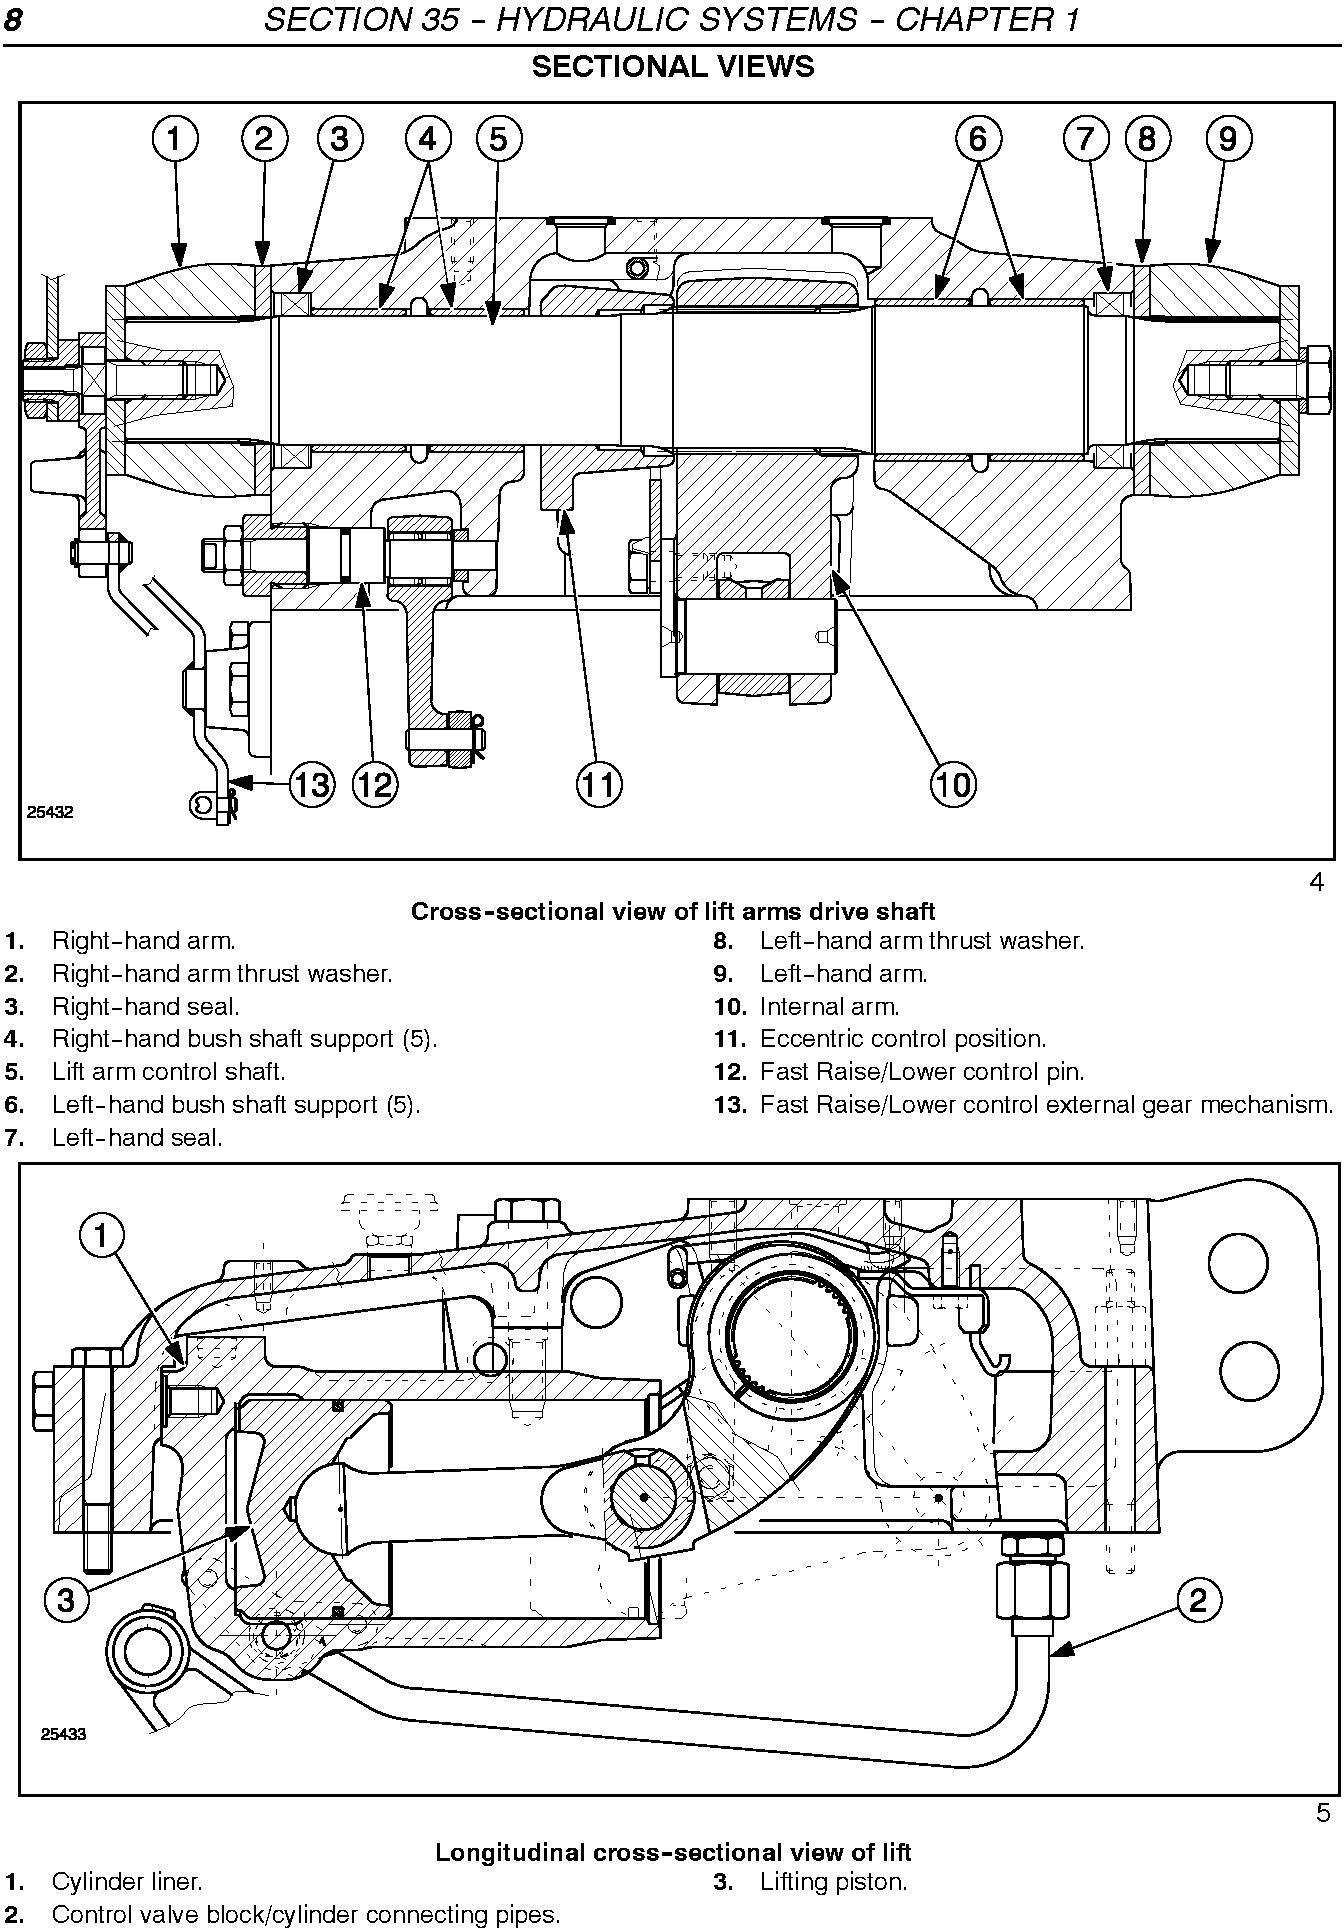 New Holland T4020, T4030, T4040, T4050 Standard Tractors Service Manual - 1